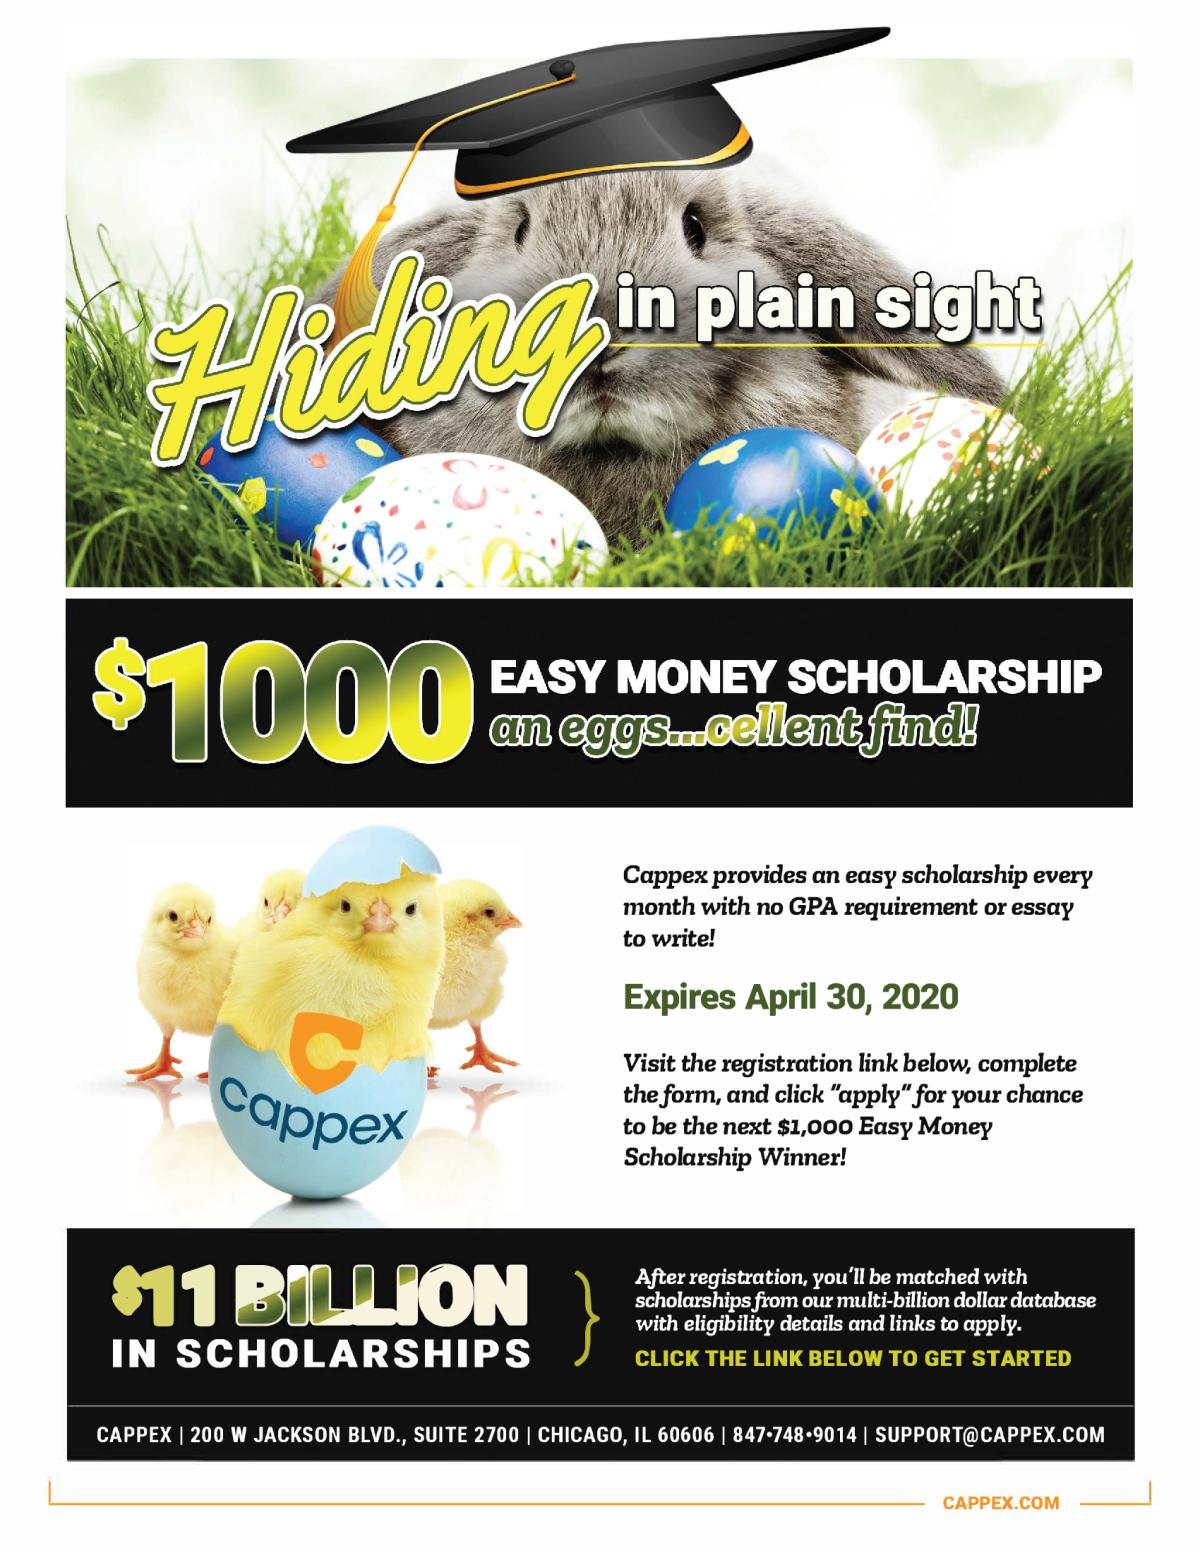 Image of a flyer titled Eggscellent $1,000 Easy Money Scholarship